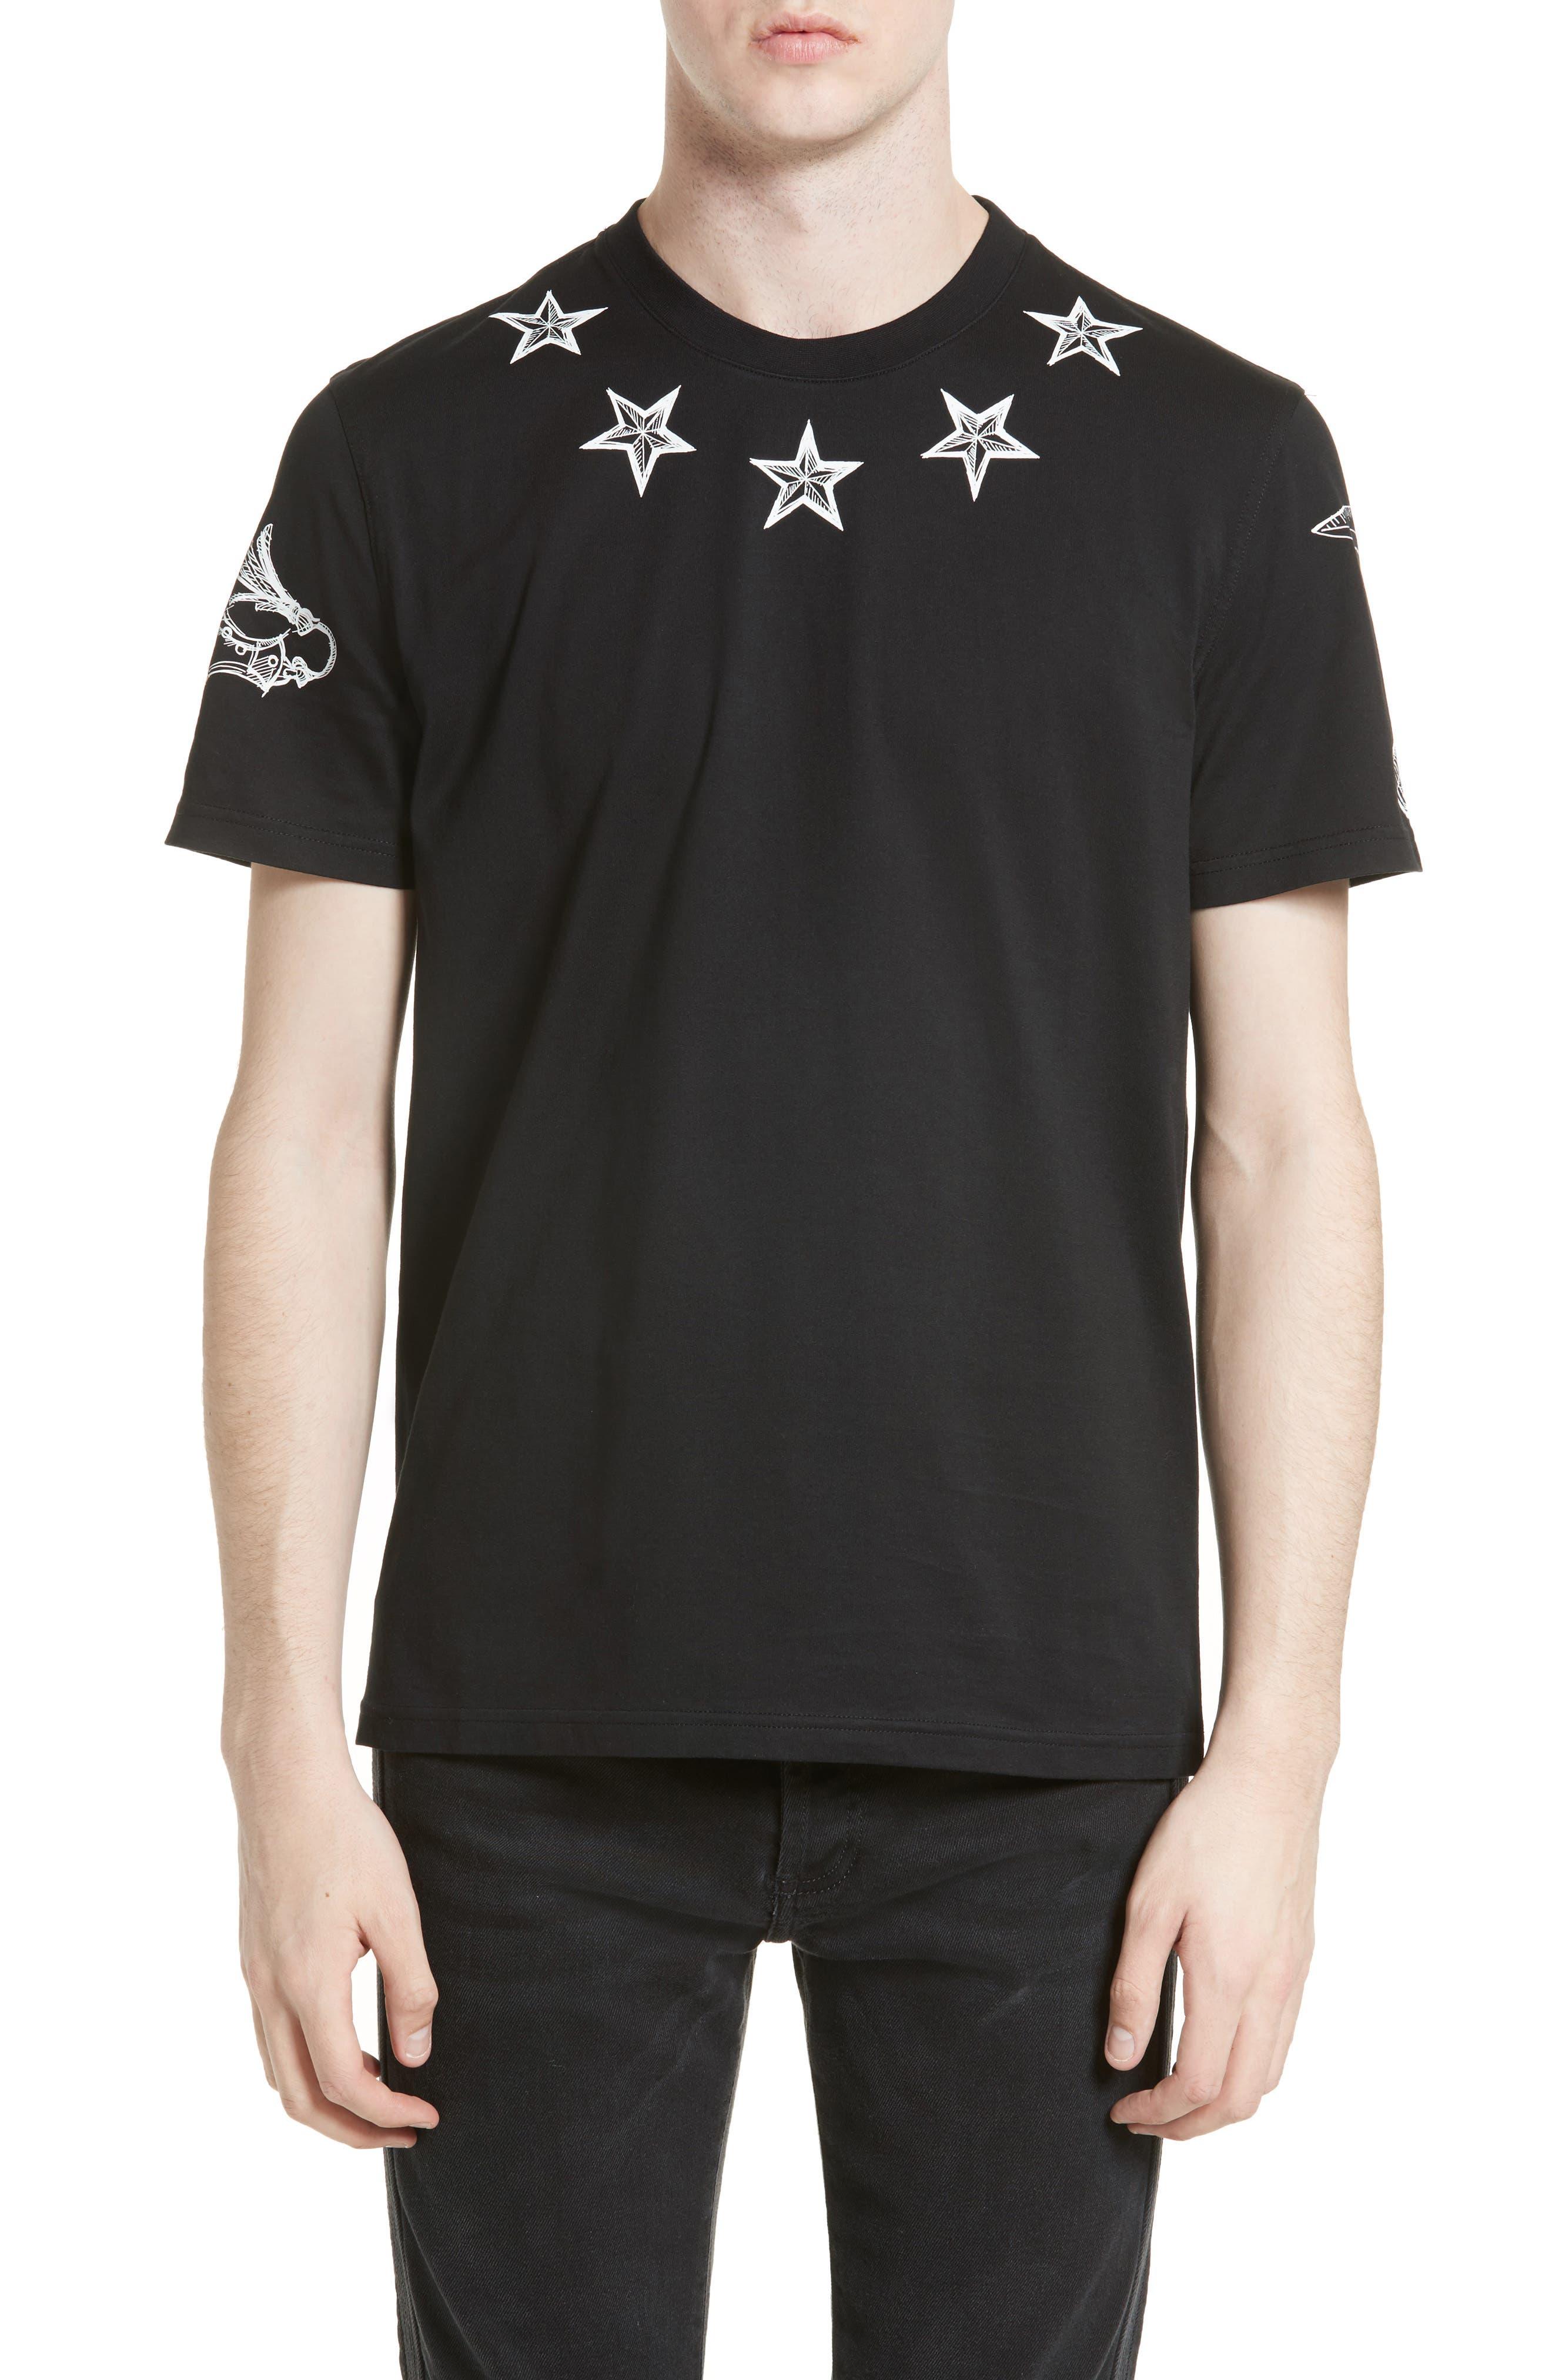 Givenchy Tattoo Print Cuban Fit T-Shirt